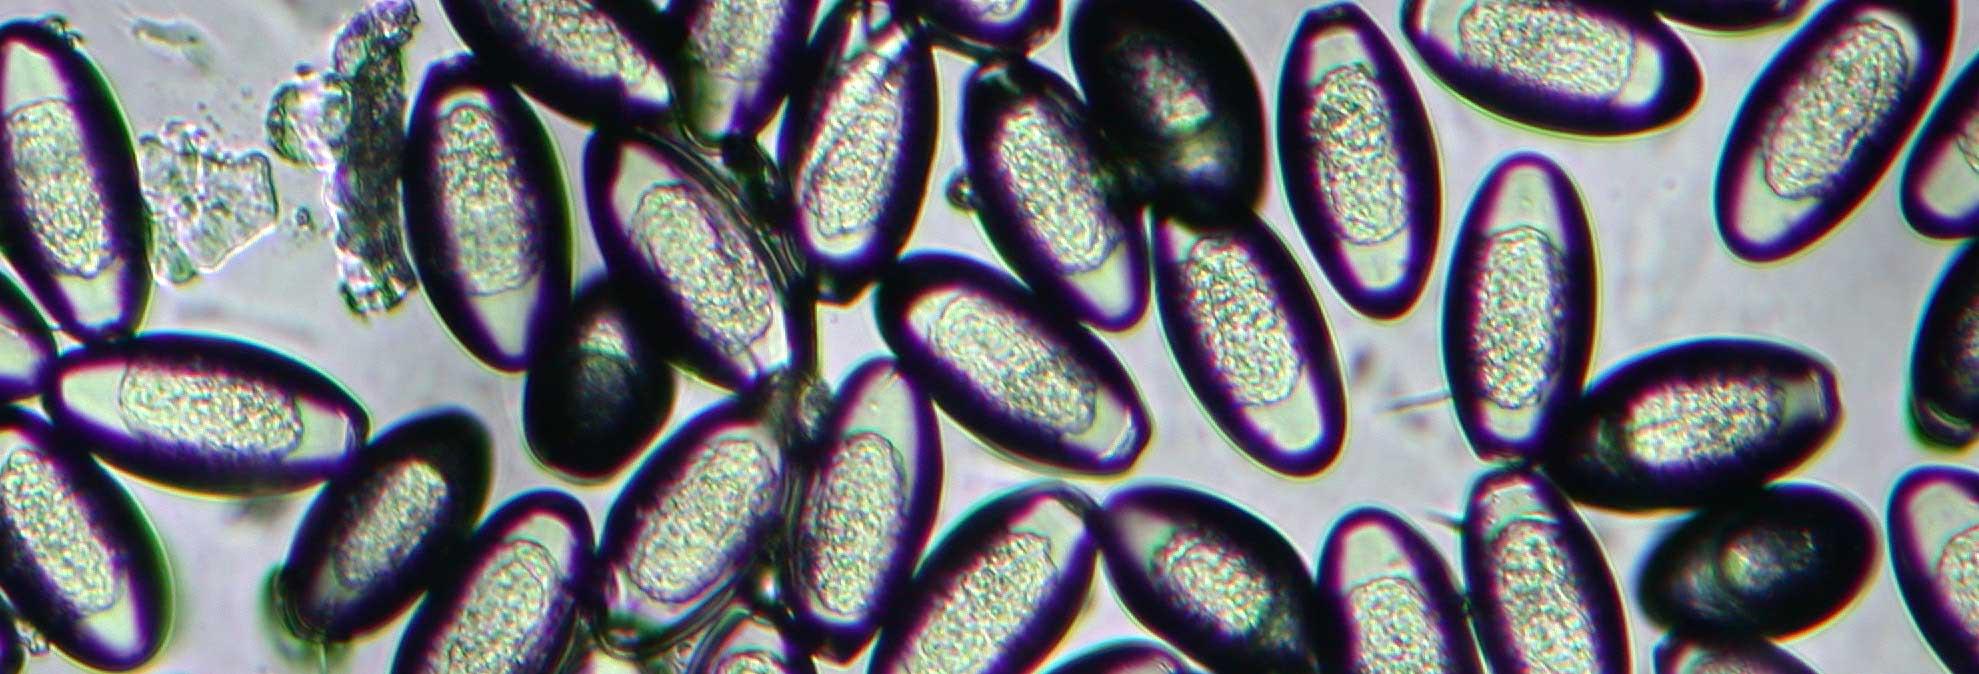 Papilomatosis bovina prevencion Giardini naxos taormina entfernung